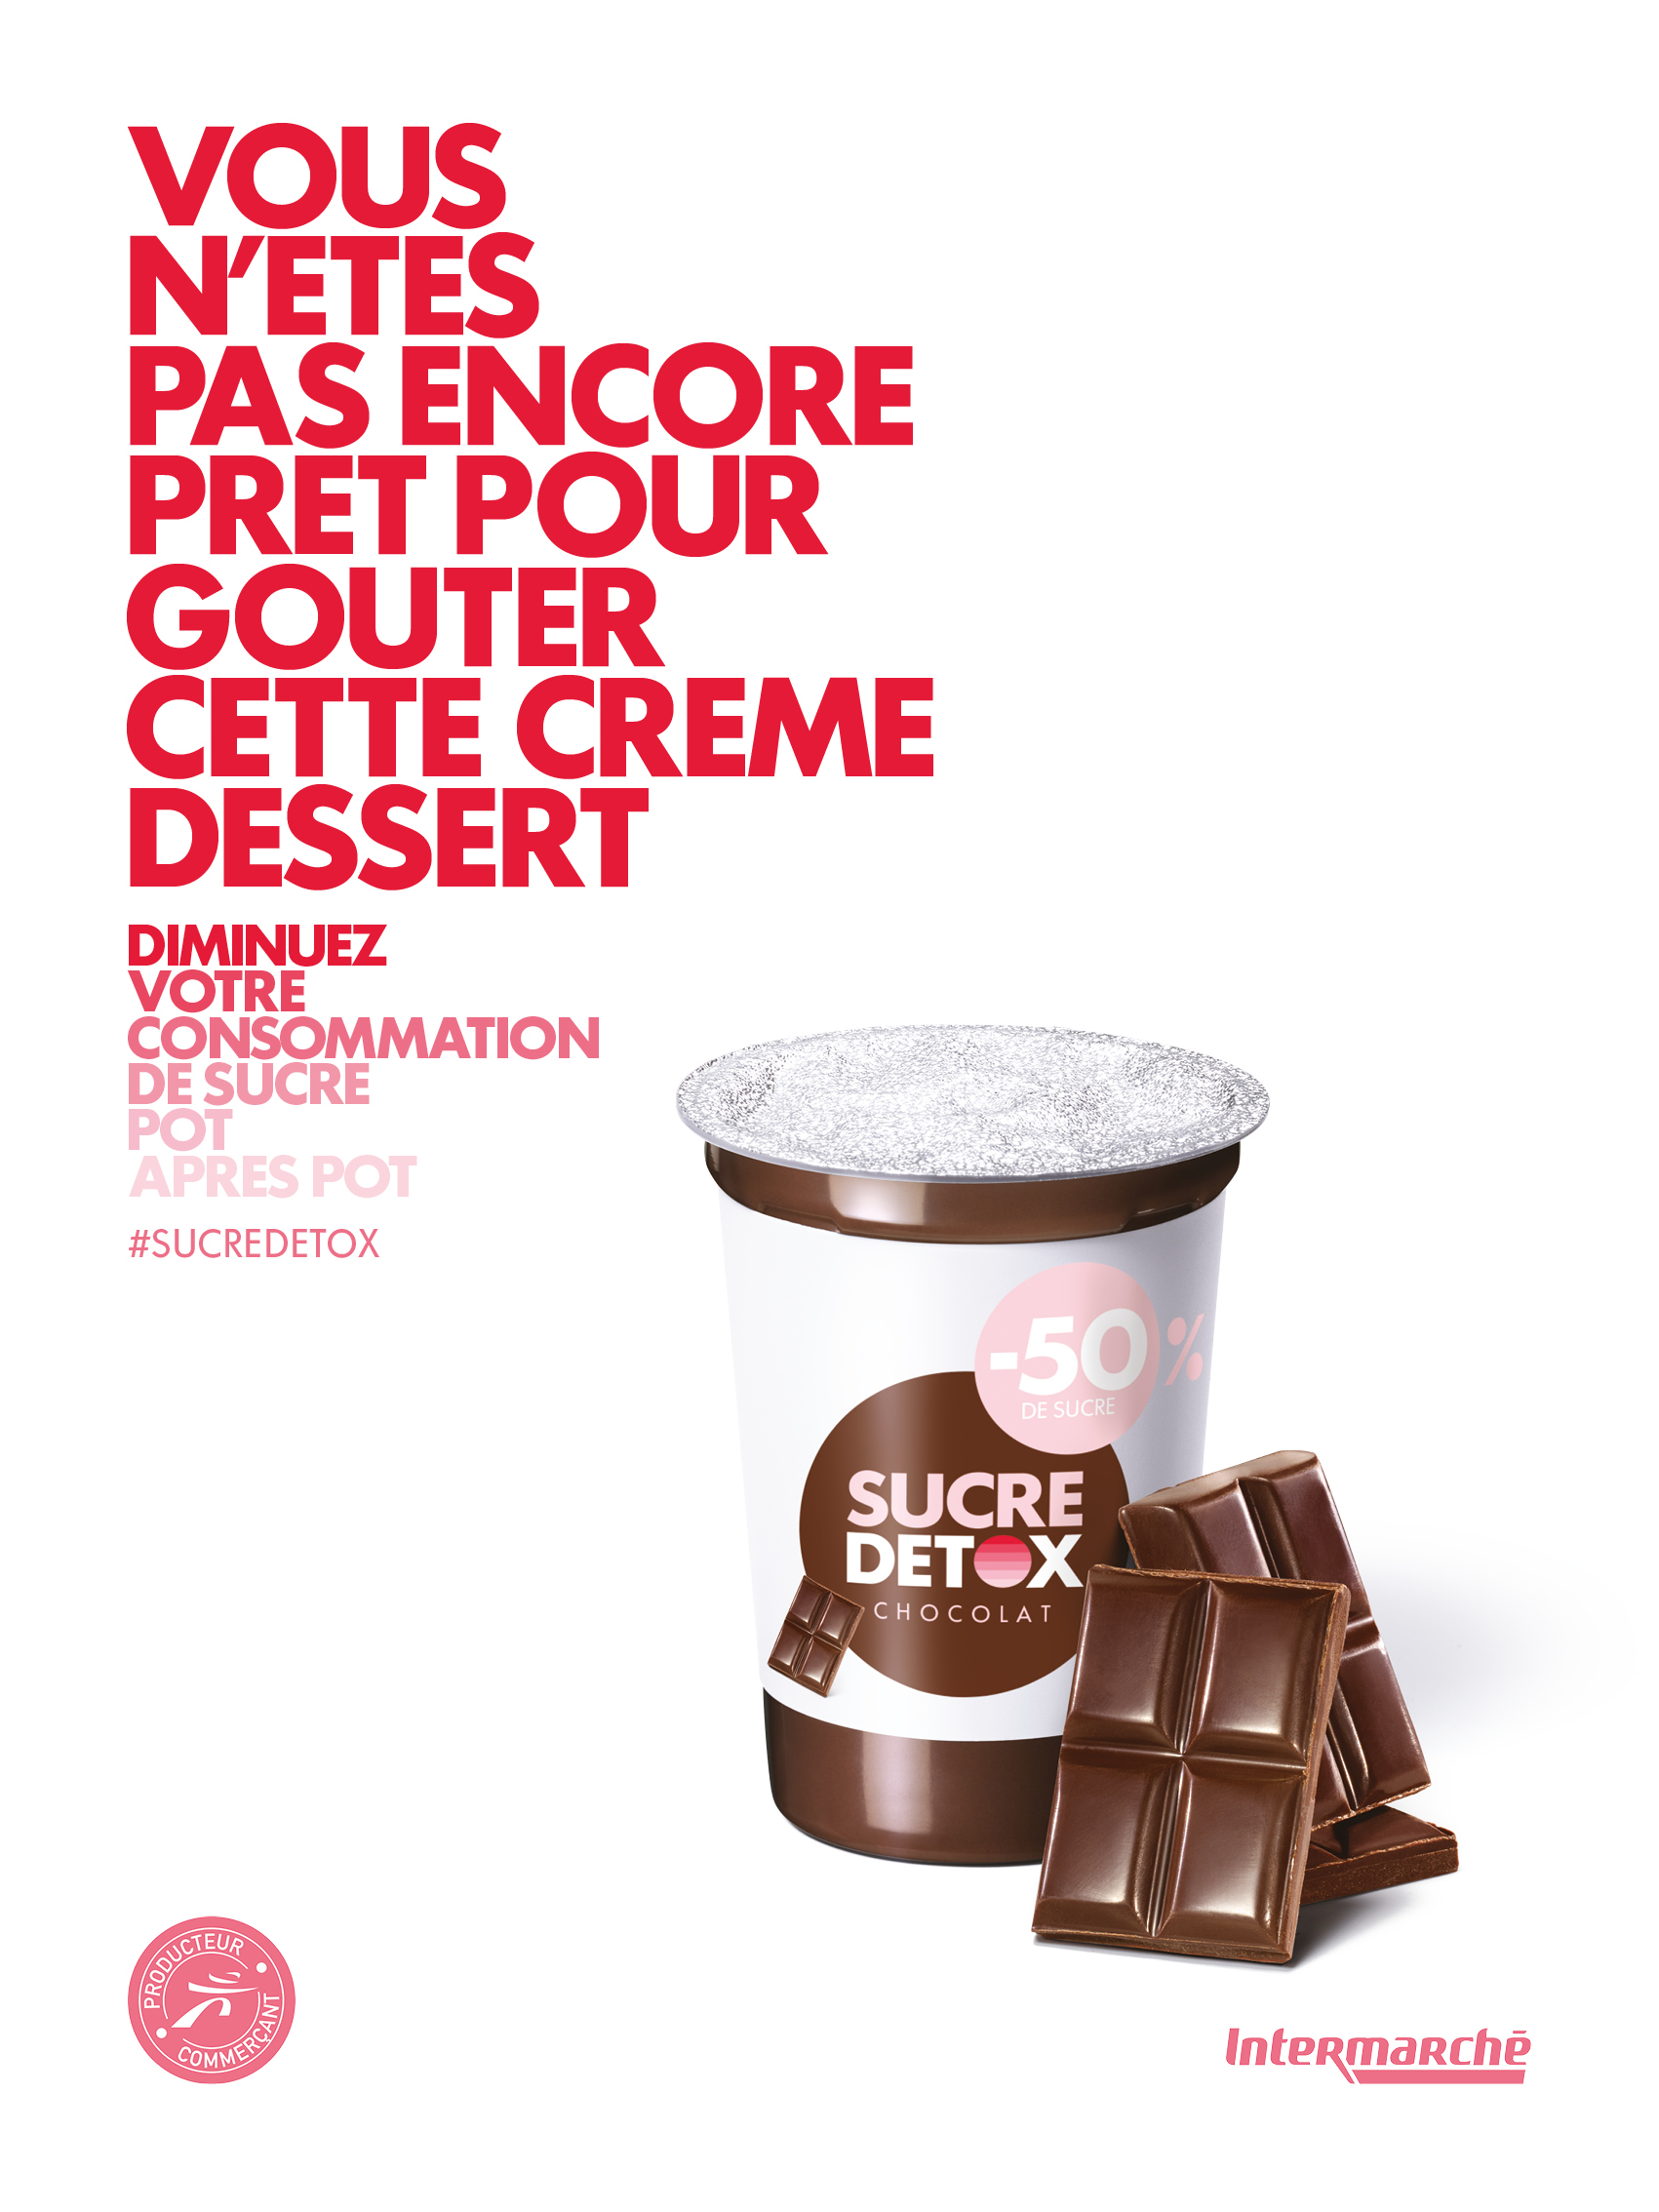 intermarche-sucre-detox-creme-dessert-pourcentage-sucre-semaine-agence-marcel-1